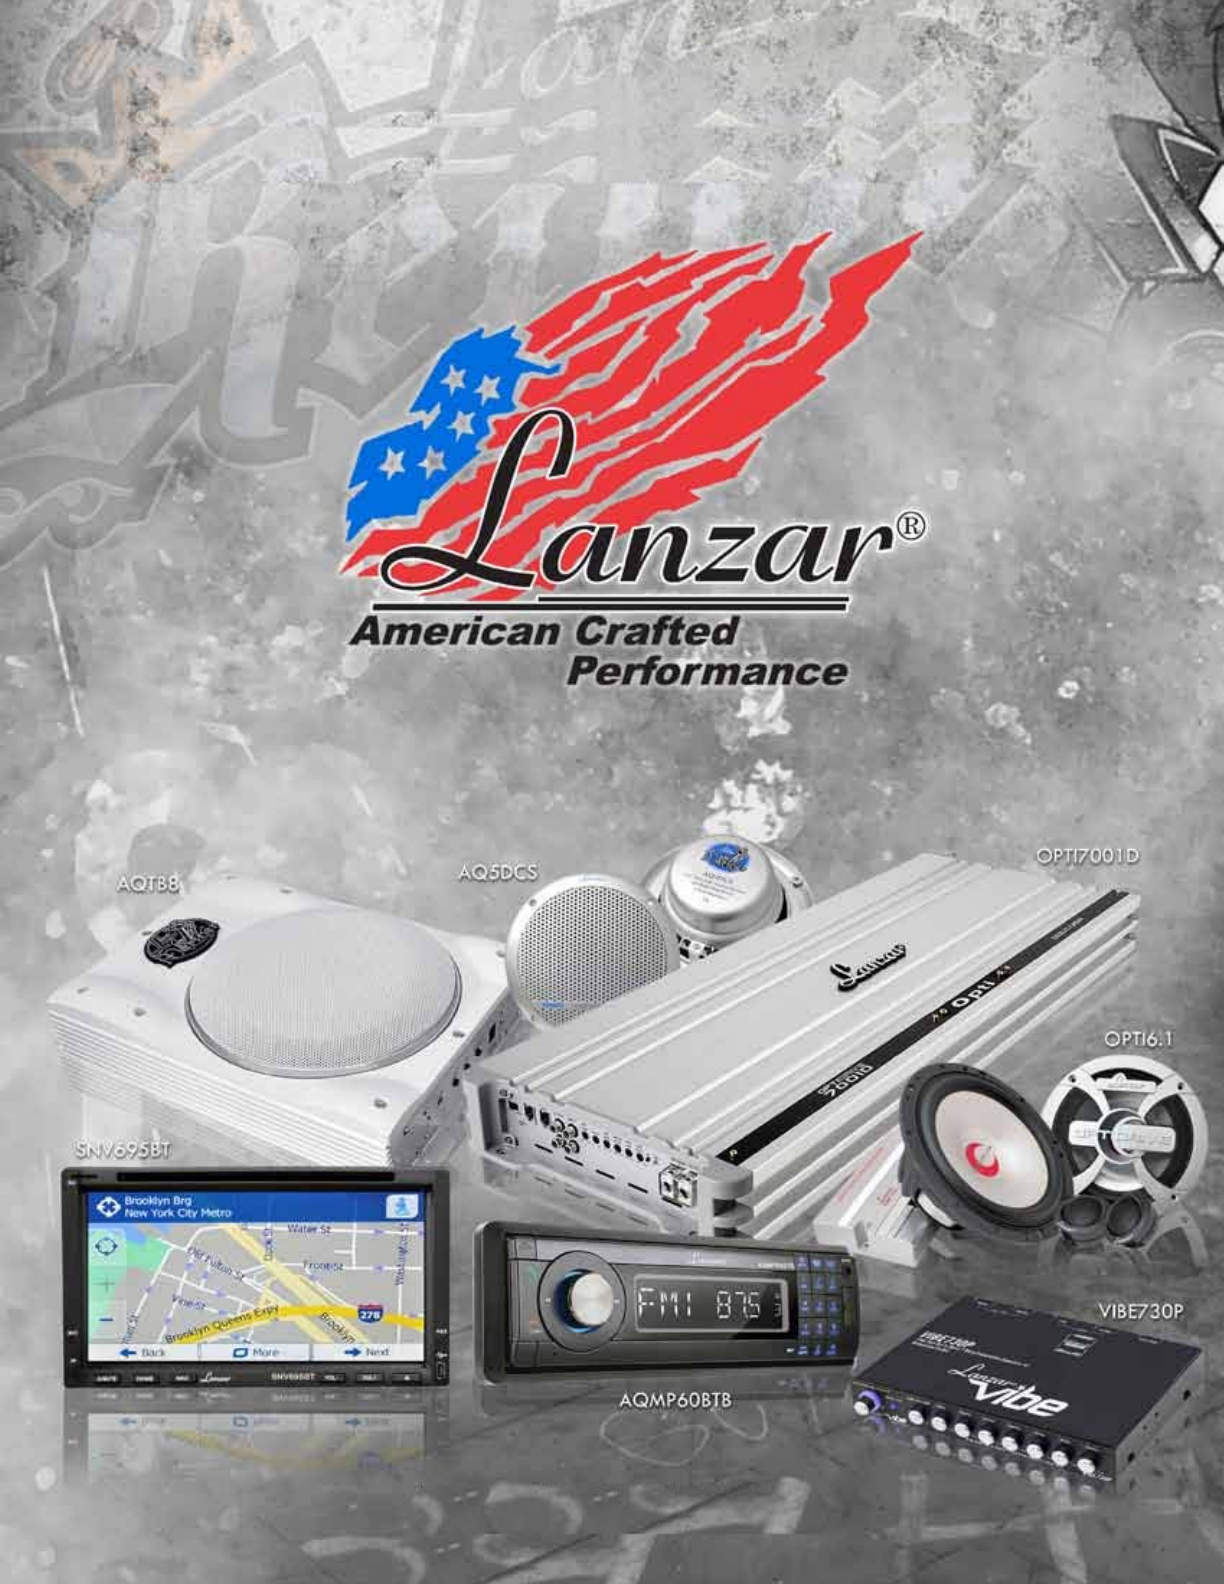 Lanzar Speakers Installation Instructions Max Mxa224 Catalog 210hz Subwoofer Processing Circuit Low Pass Filter Board Kit Speaker System